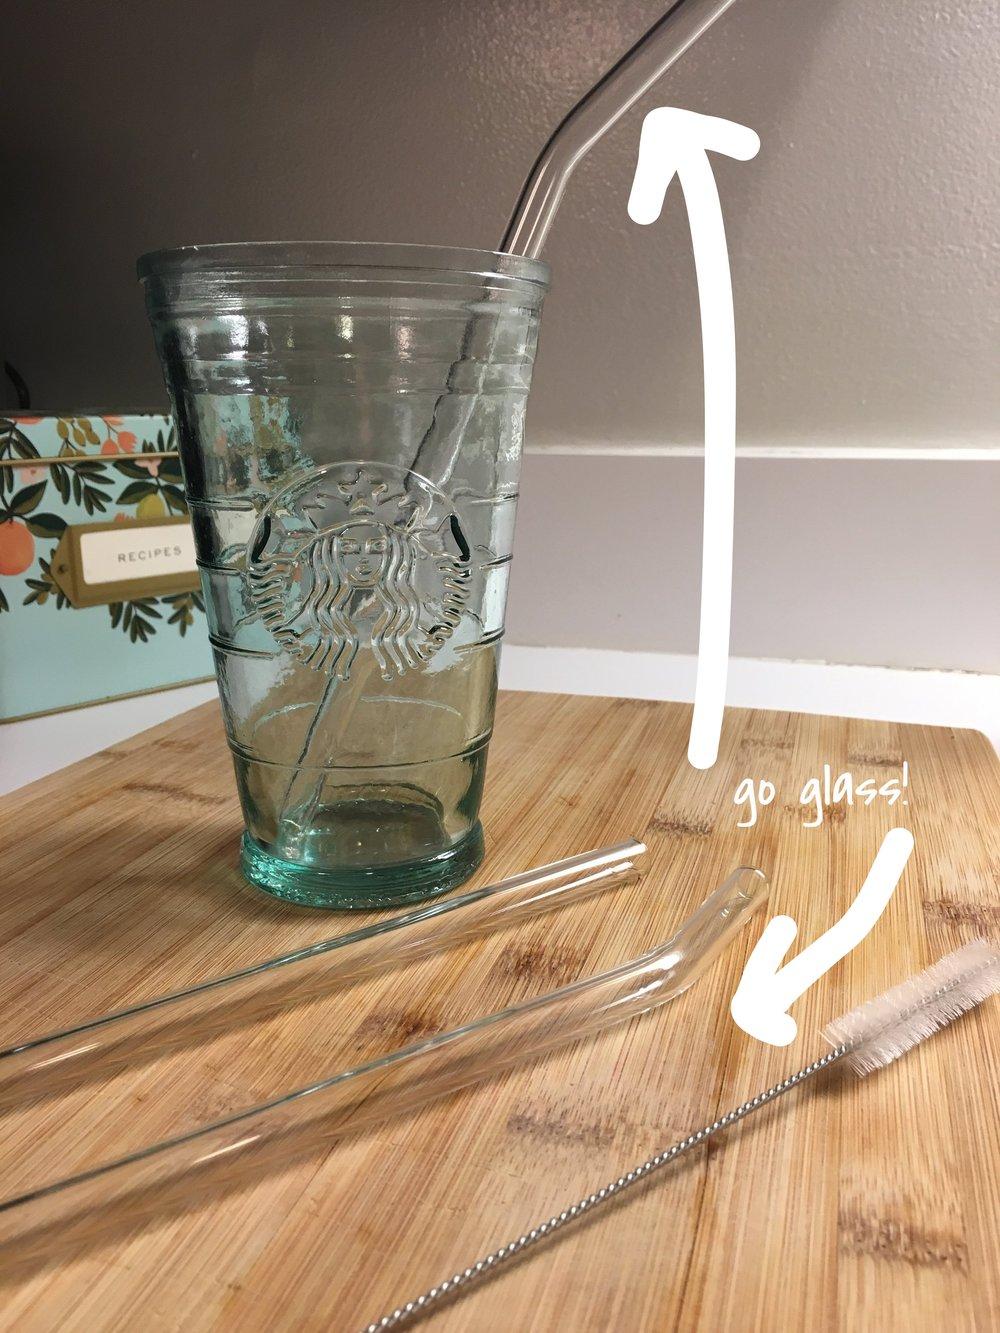 Glass > Plastic